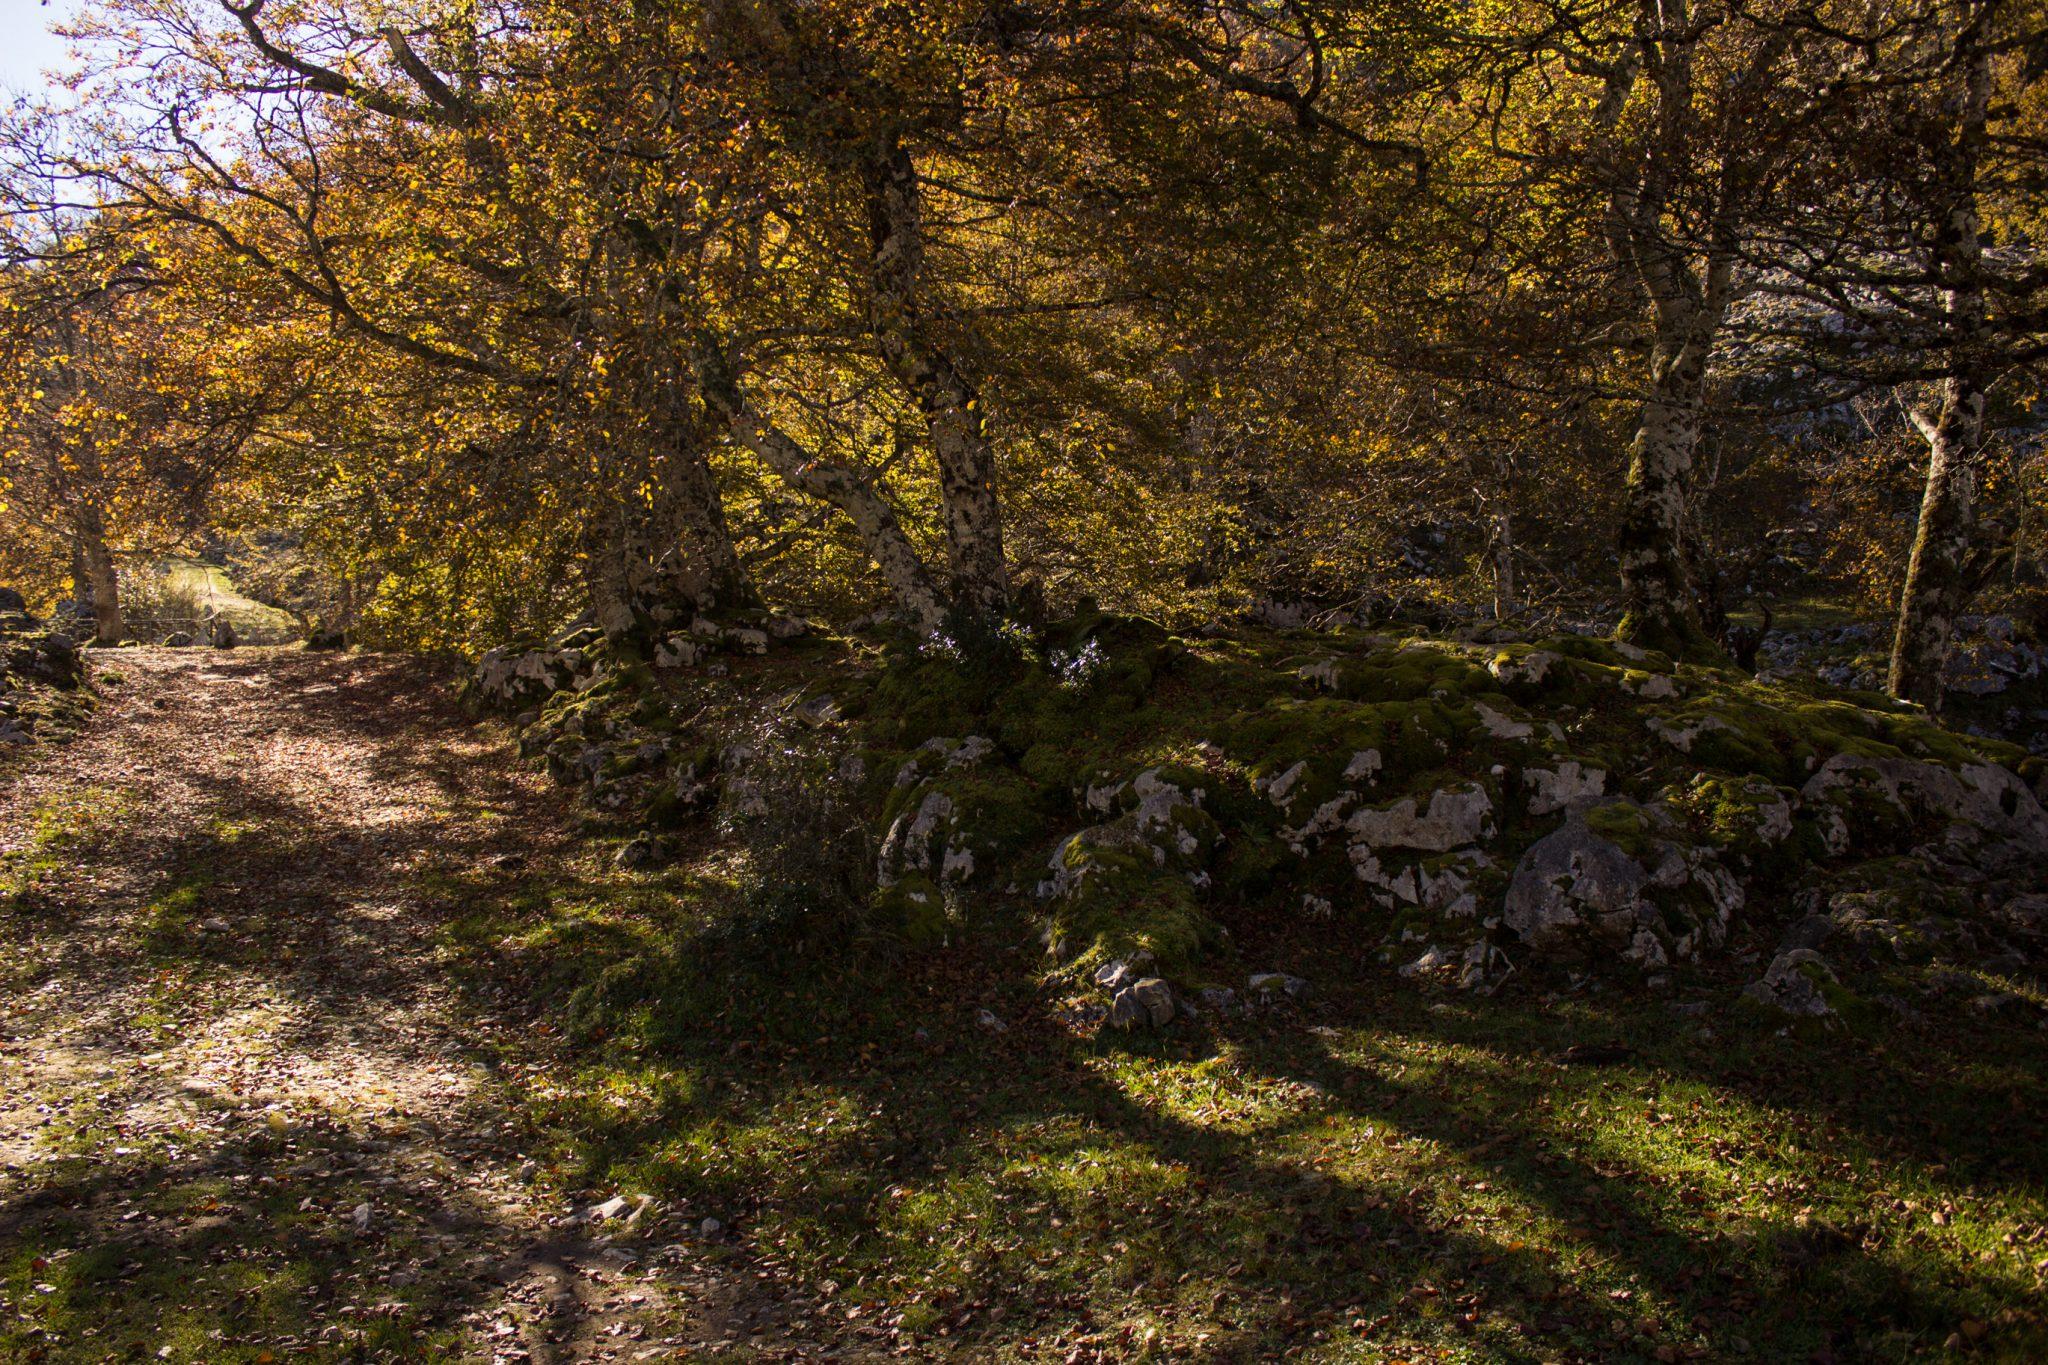 Wanderung Mirador de Ordiales Picos de Europa Spanien,  Herbst, Herbststimmung, Wanderweg, Bäume, Wald